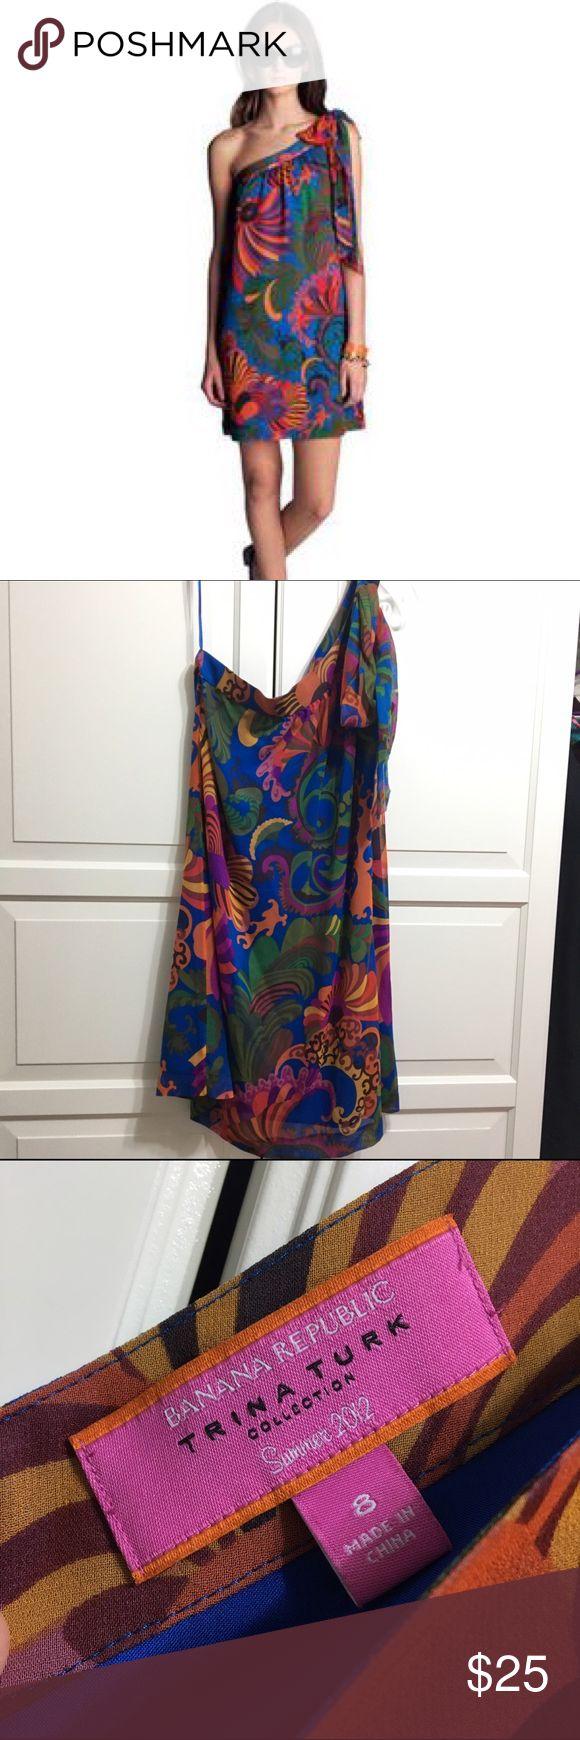 Banana Republic Trina Turk Coachella dress Worn once. Beautiful silk dress with polyester lining. Banana Republic Dresses One Shoulder